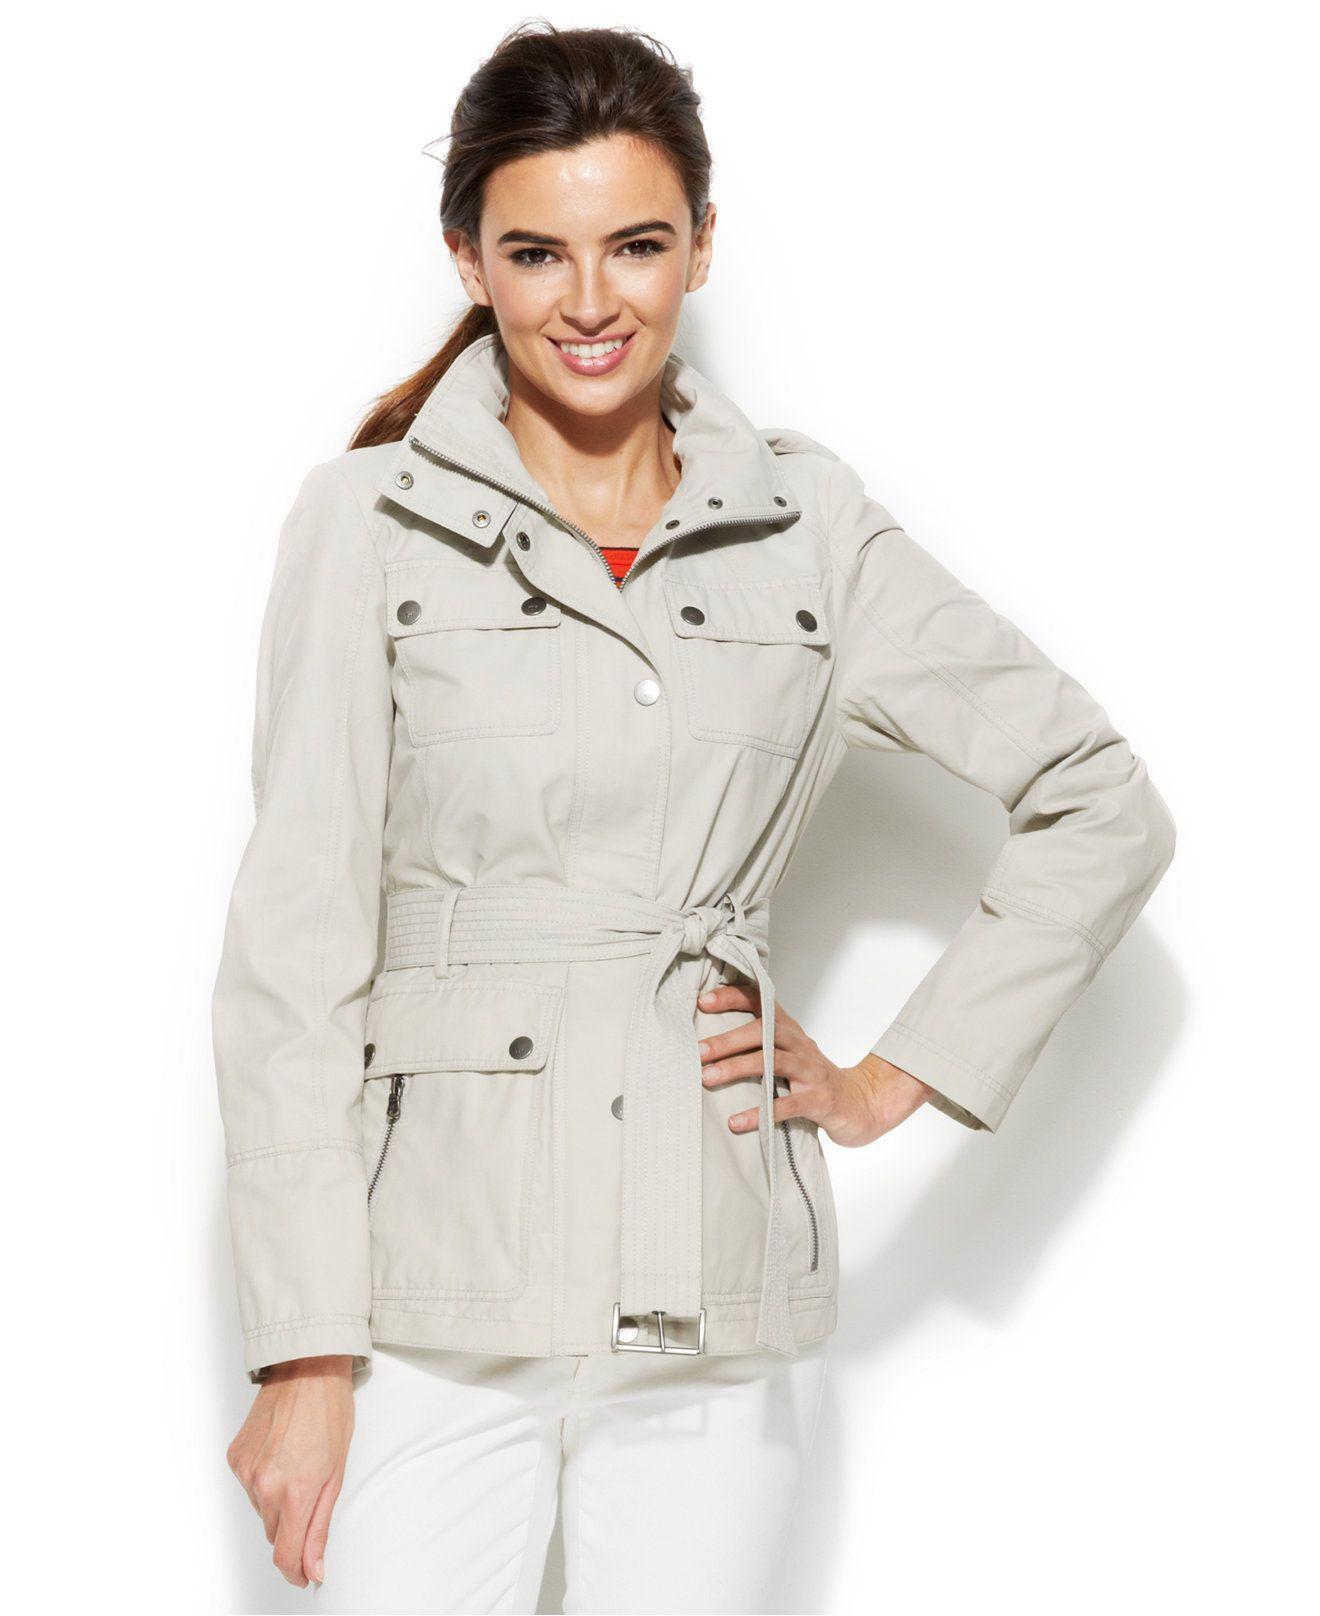 627b6db4c1233 Fall jacket Tommy Hilfiger Belted Utility Jacket - Coats - Women - Macy's